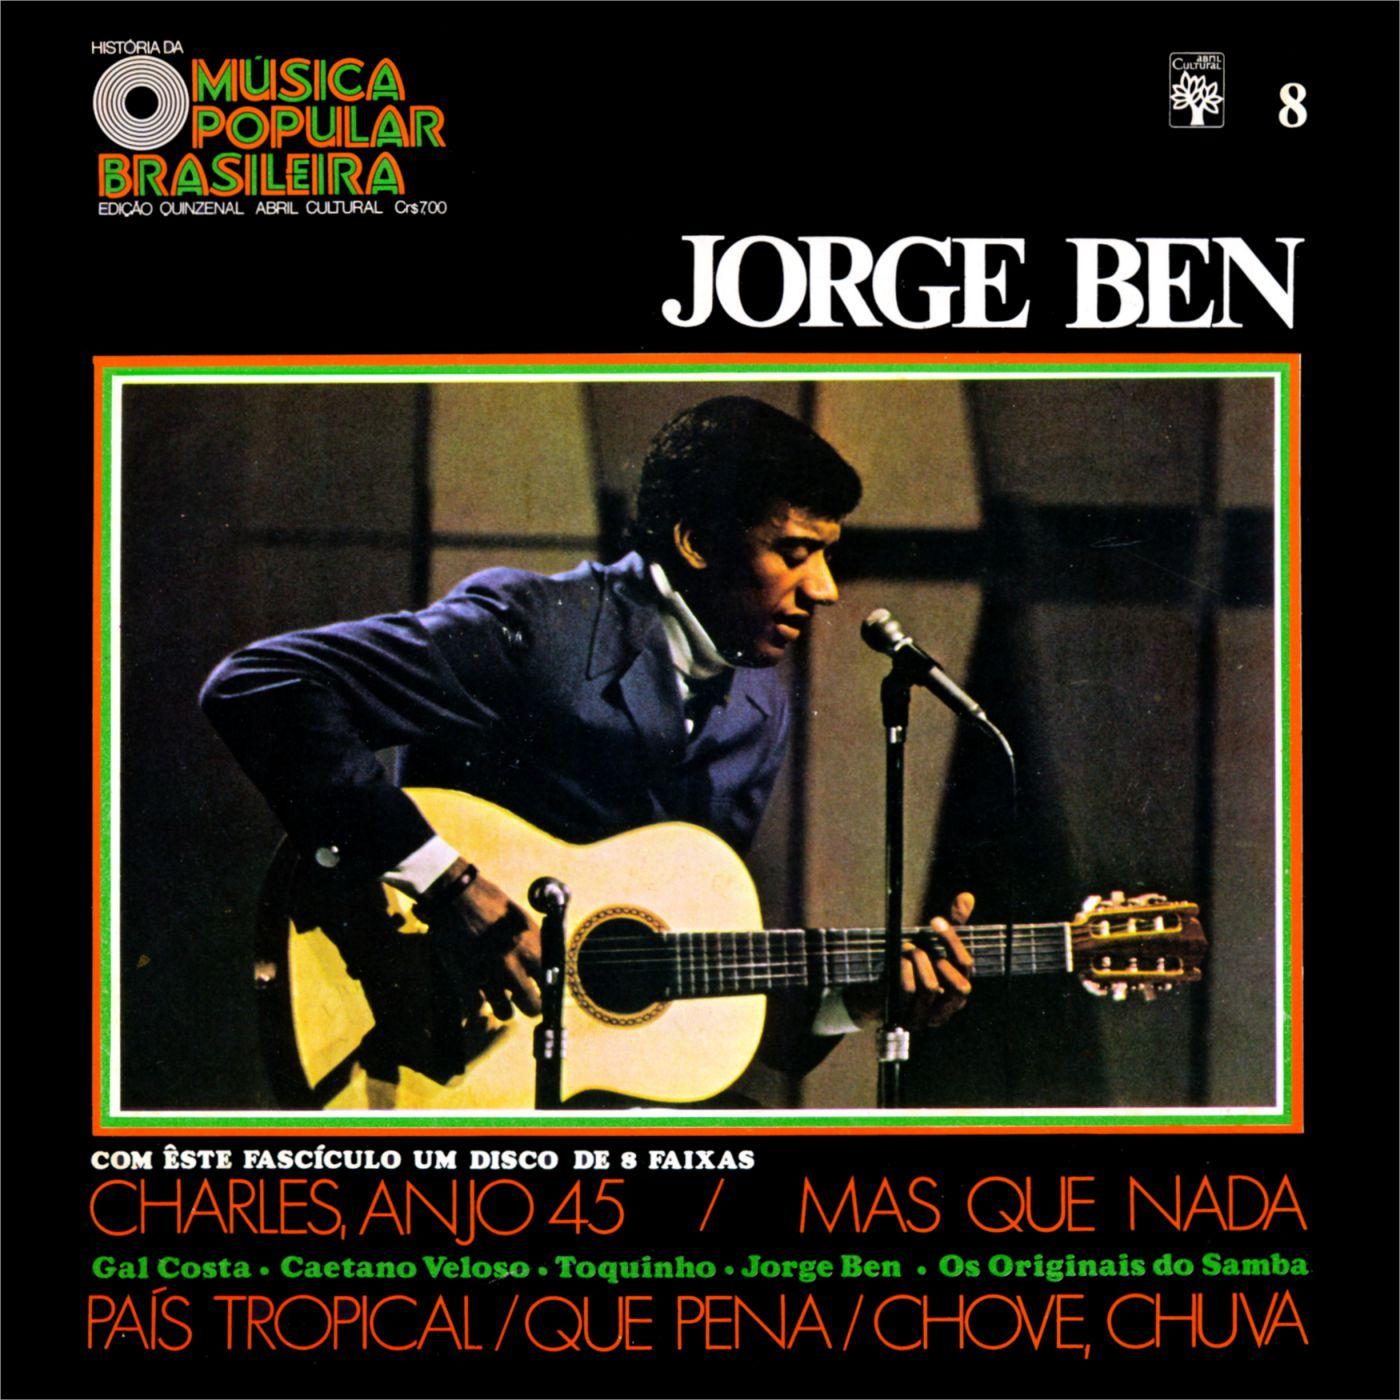 JORGE GRATUITO FERNANDA ABREU DOWNLOAD SALVE MUSICA